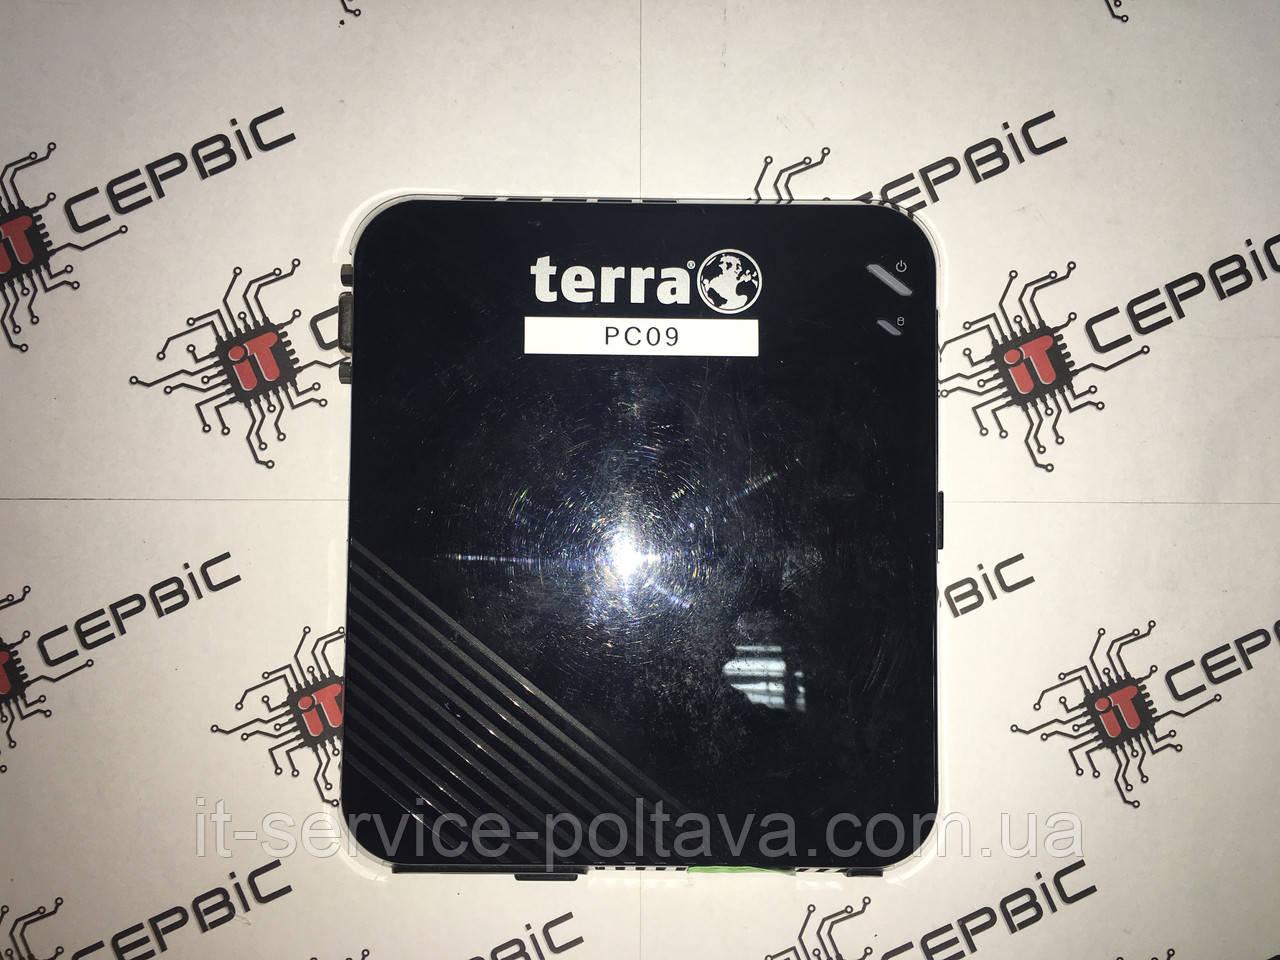 Персональний mini-computer(smart tv) TERRA 1009397